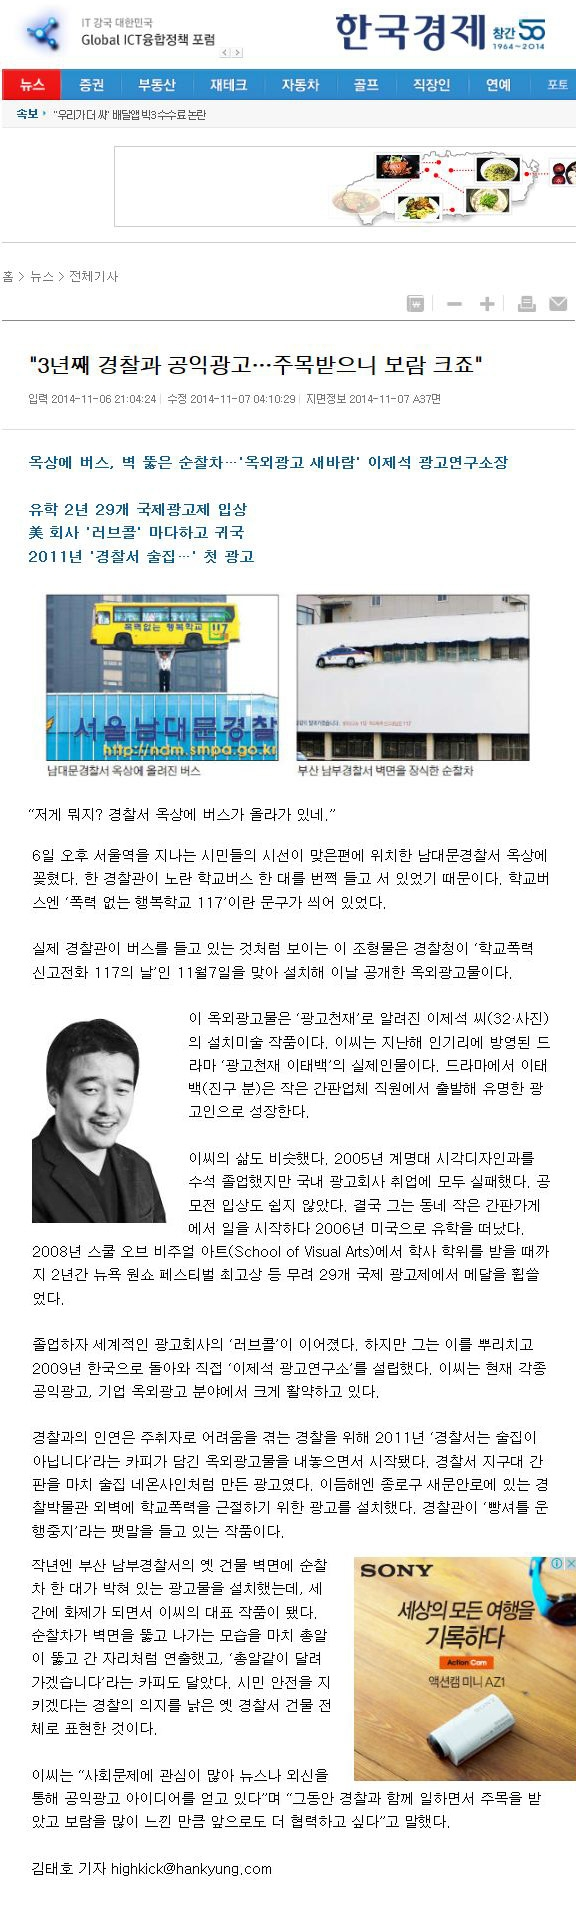 httpwww.hankyung.comnewsappnewsview.phpaid=2014110617501.JPG